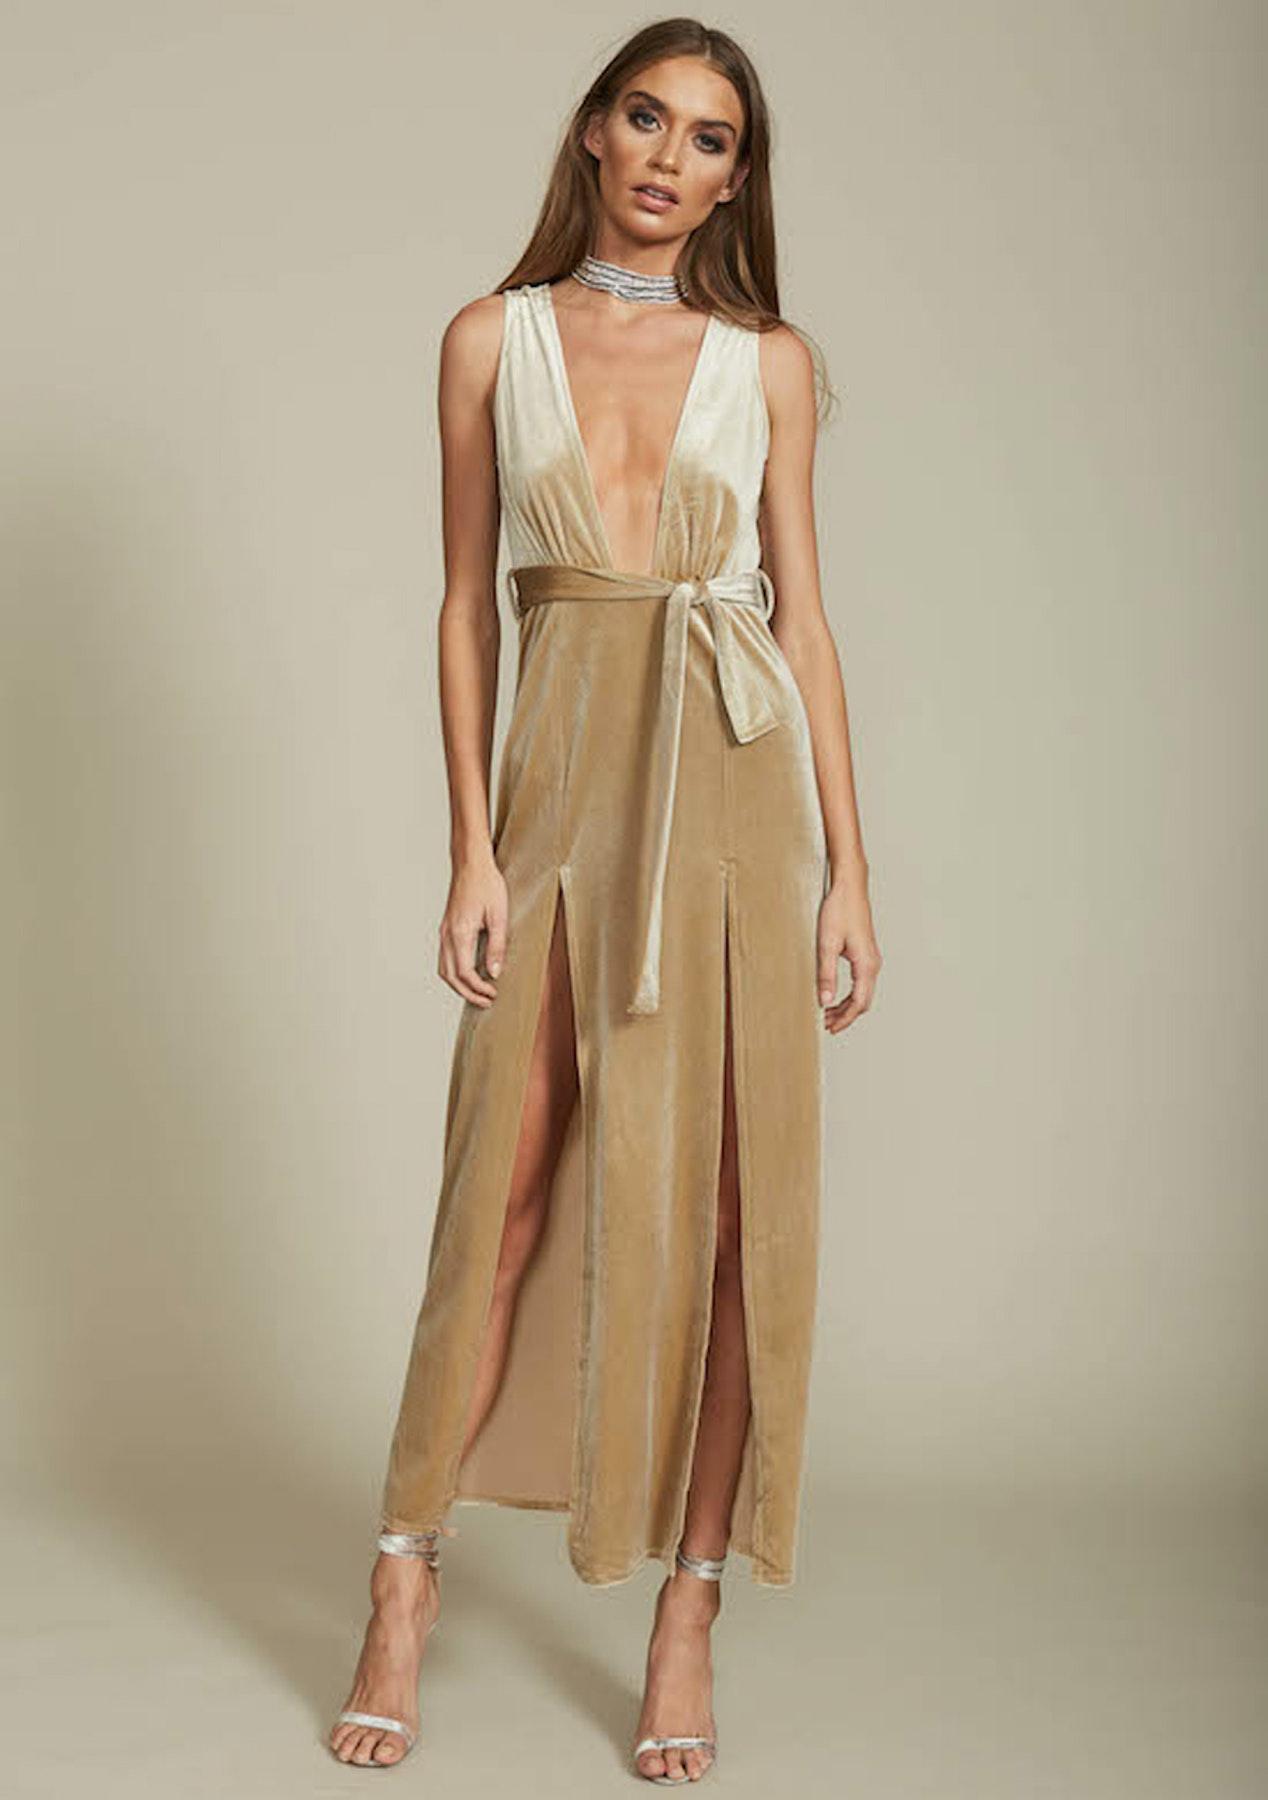 5fcfadda0125 Lioness - Shut It Down Velvet Dress - Nude - Shopping Spree Womens Under  $50 - Onceit